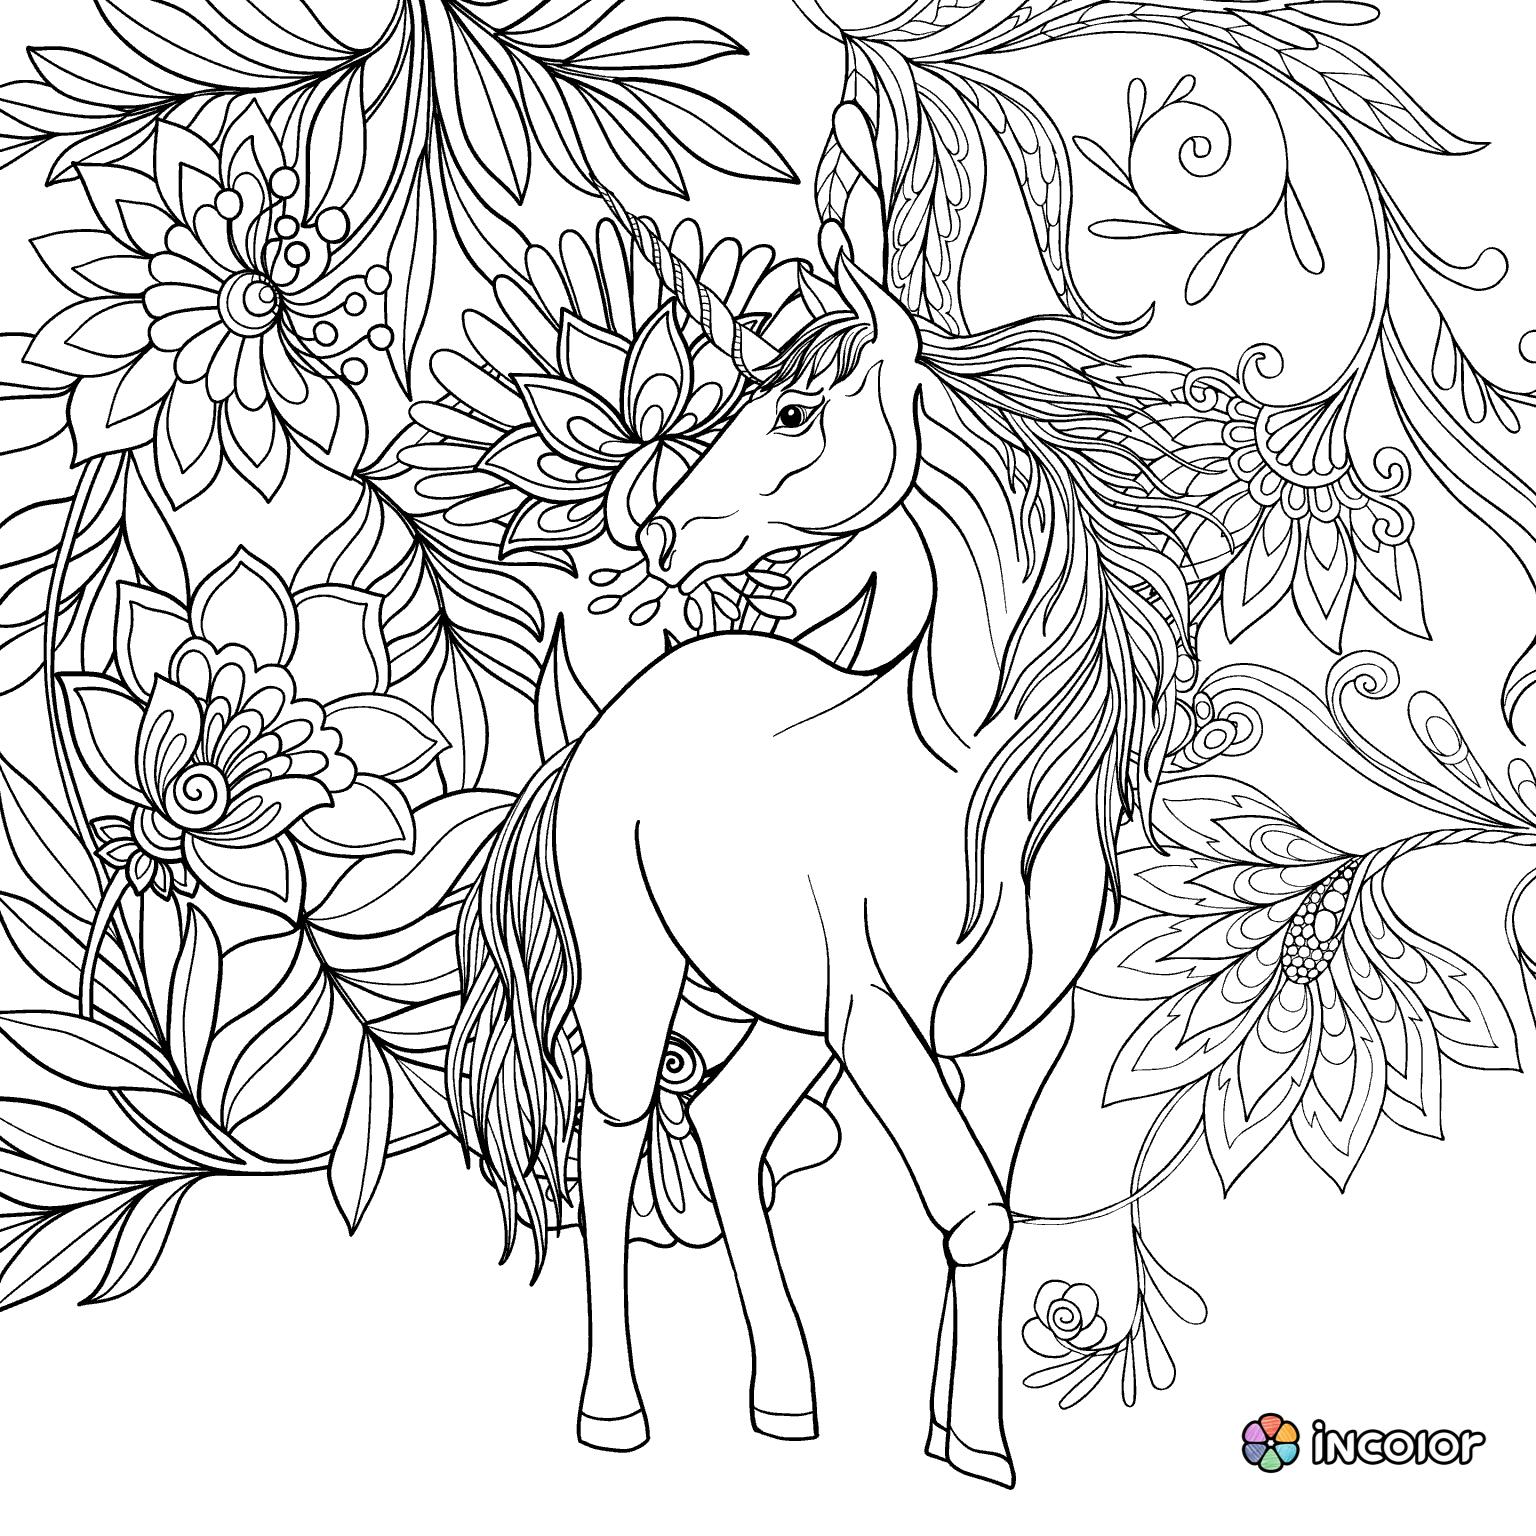 Pin van Danielle Rozendaal op coloring Pinterest Coloring pages